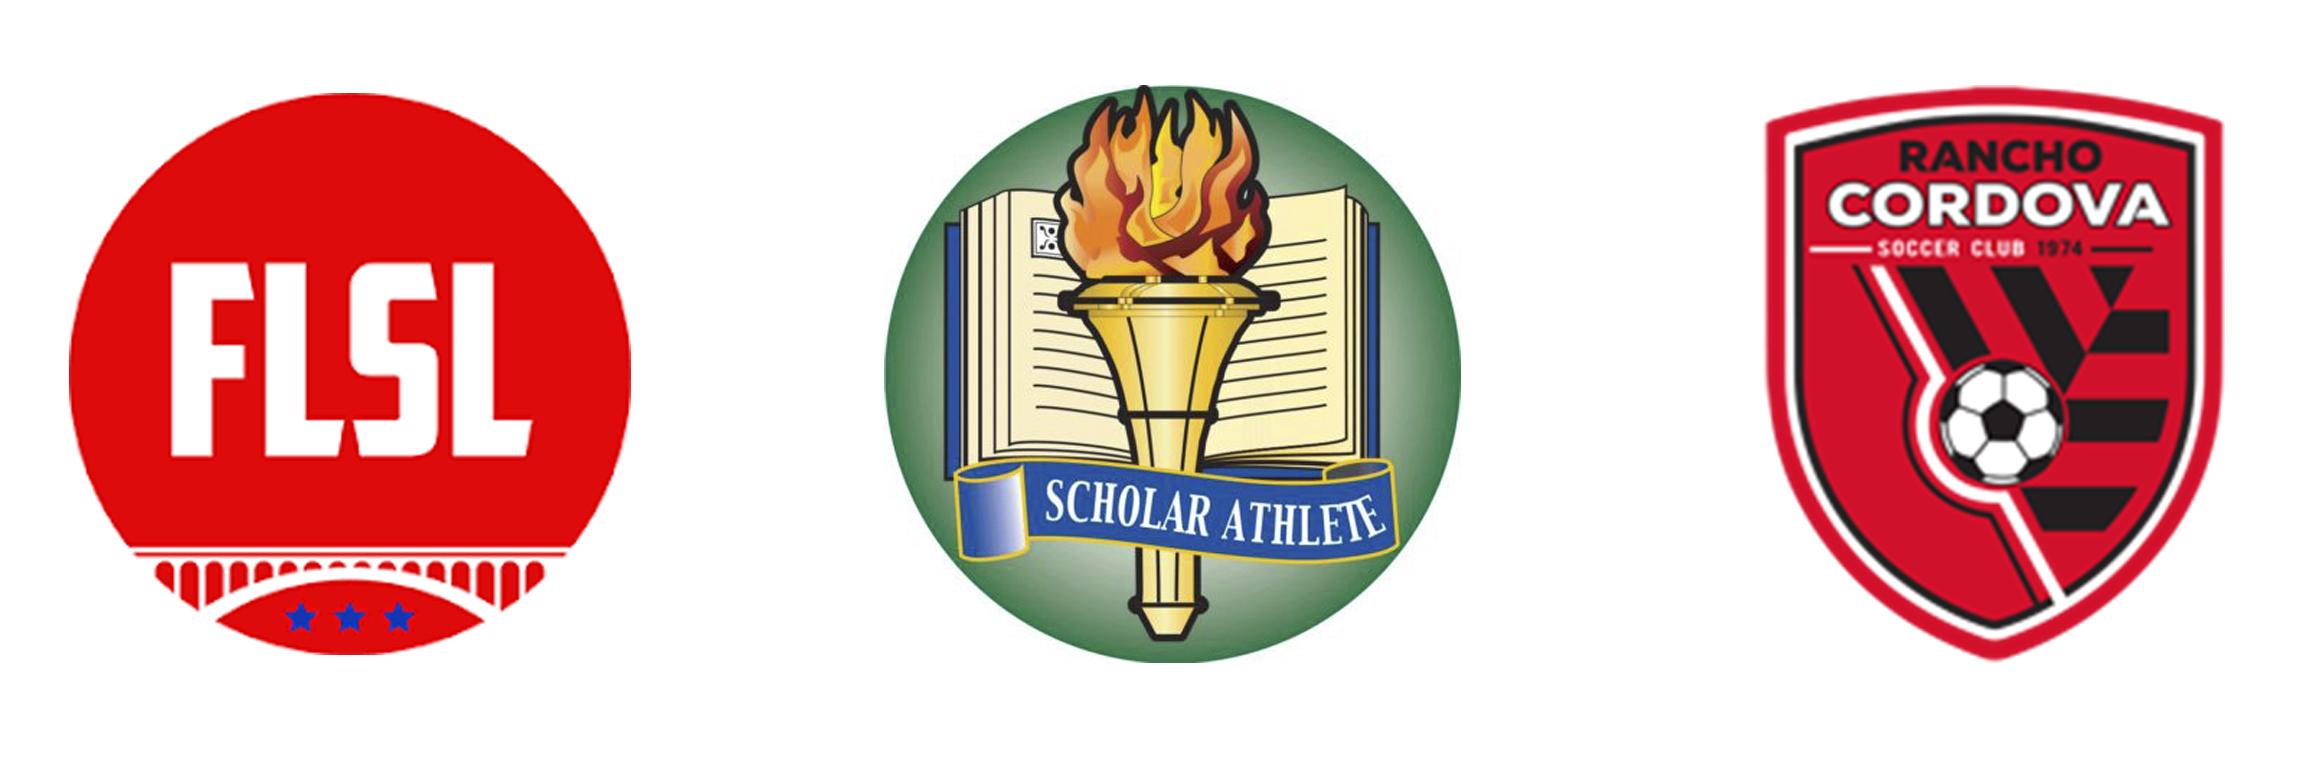 scholar_athlete_logos